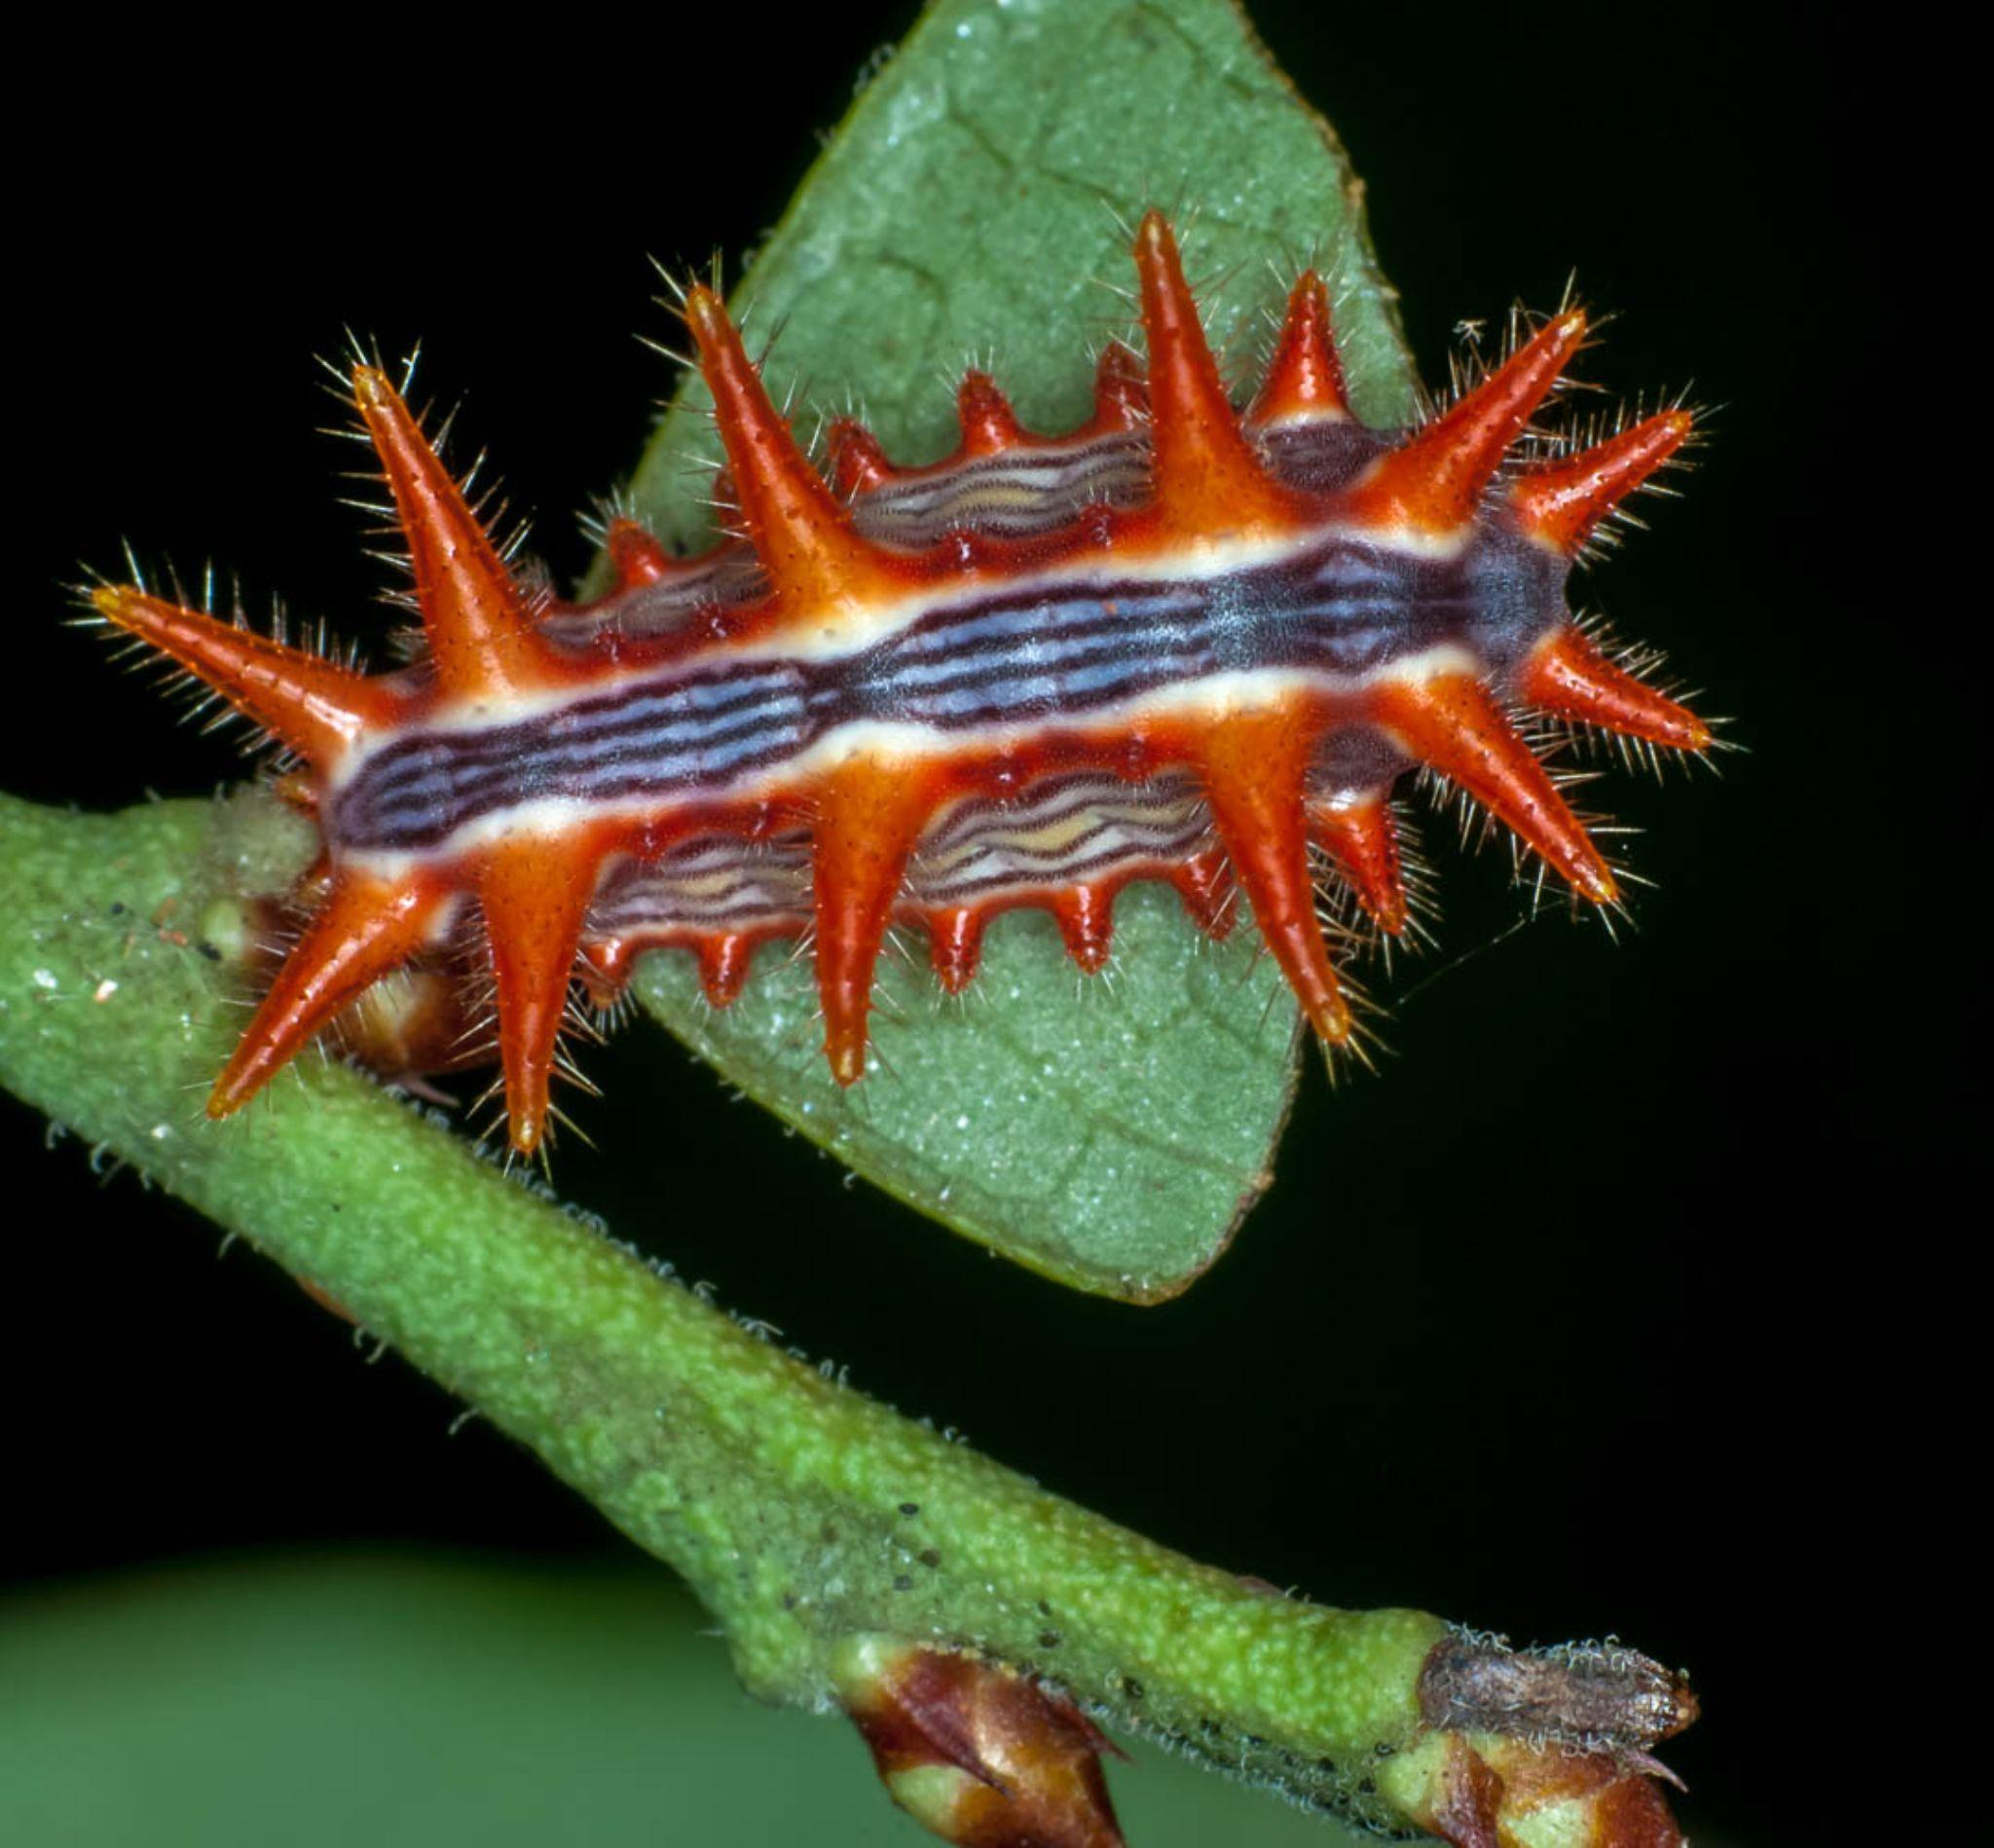 Stinging rose slug caterpillar - Parasa indetermina by ScreaminScott